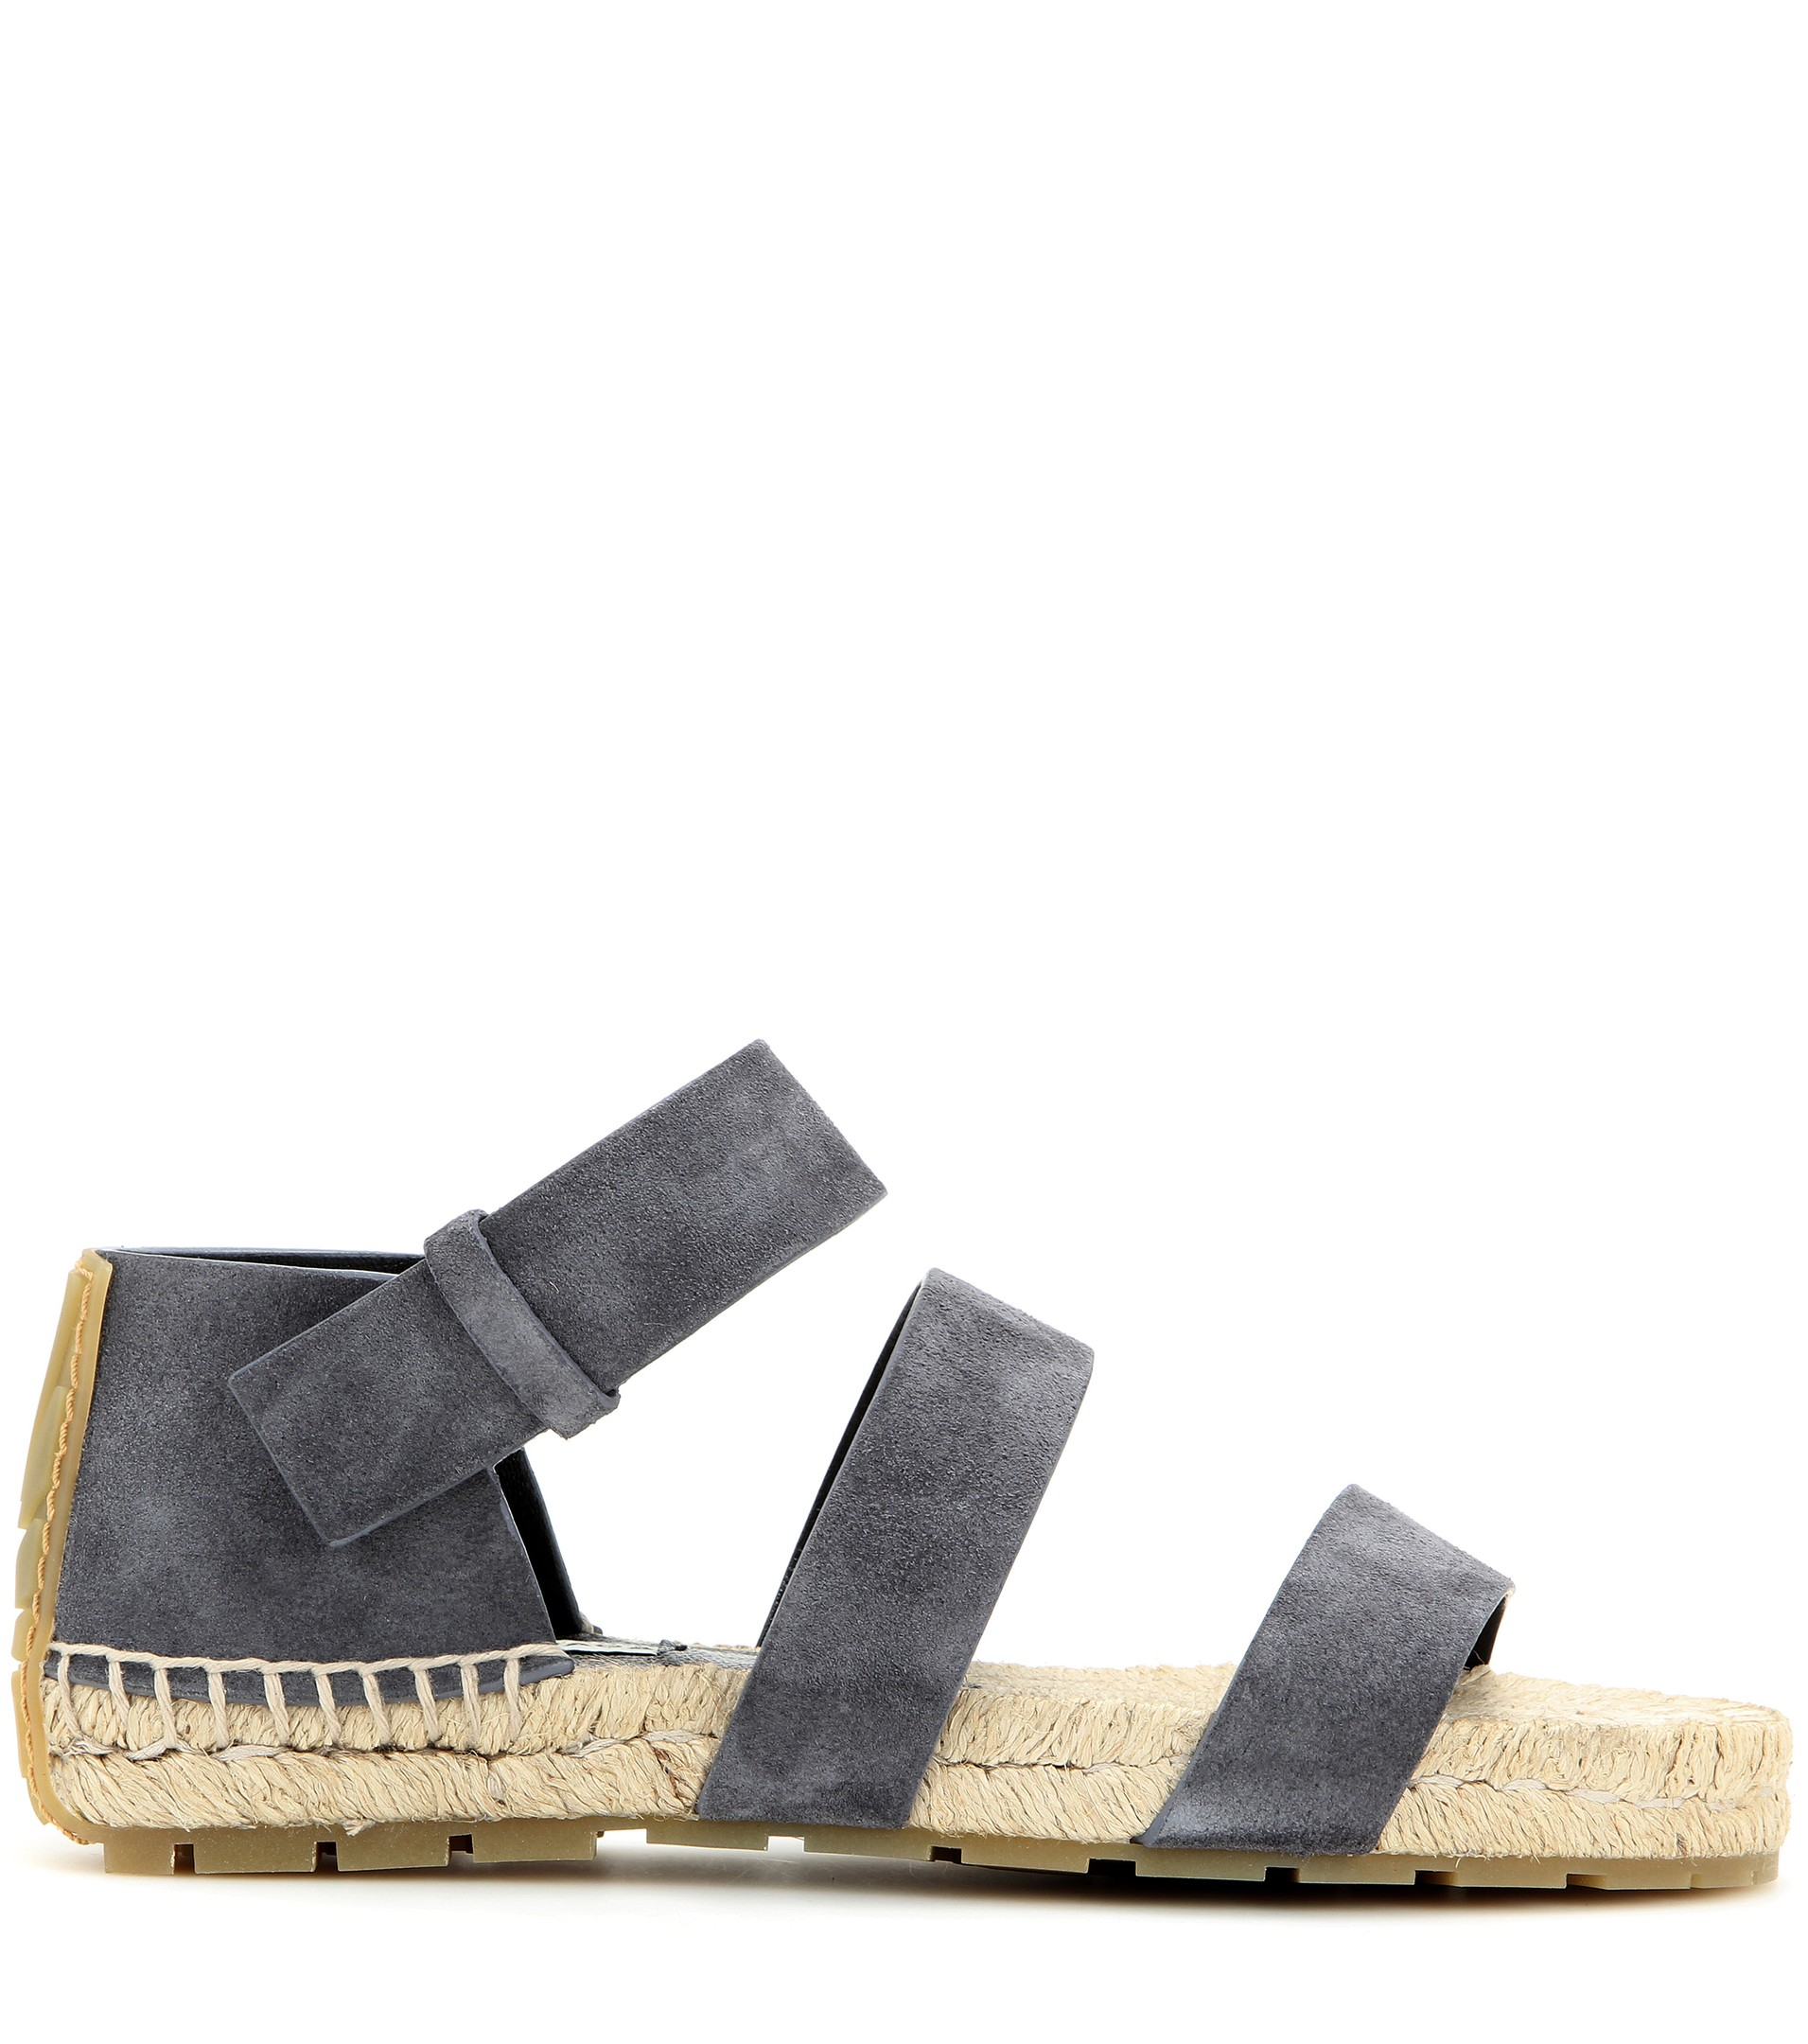 Balenciaga Suede Sandals